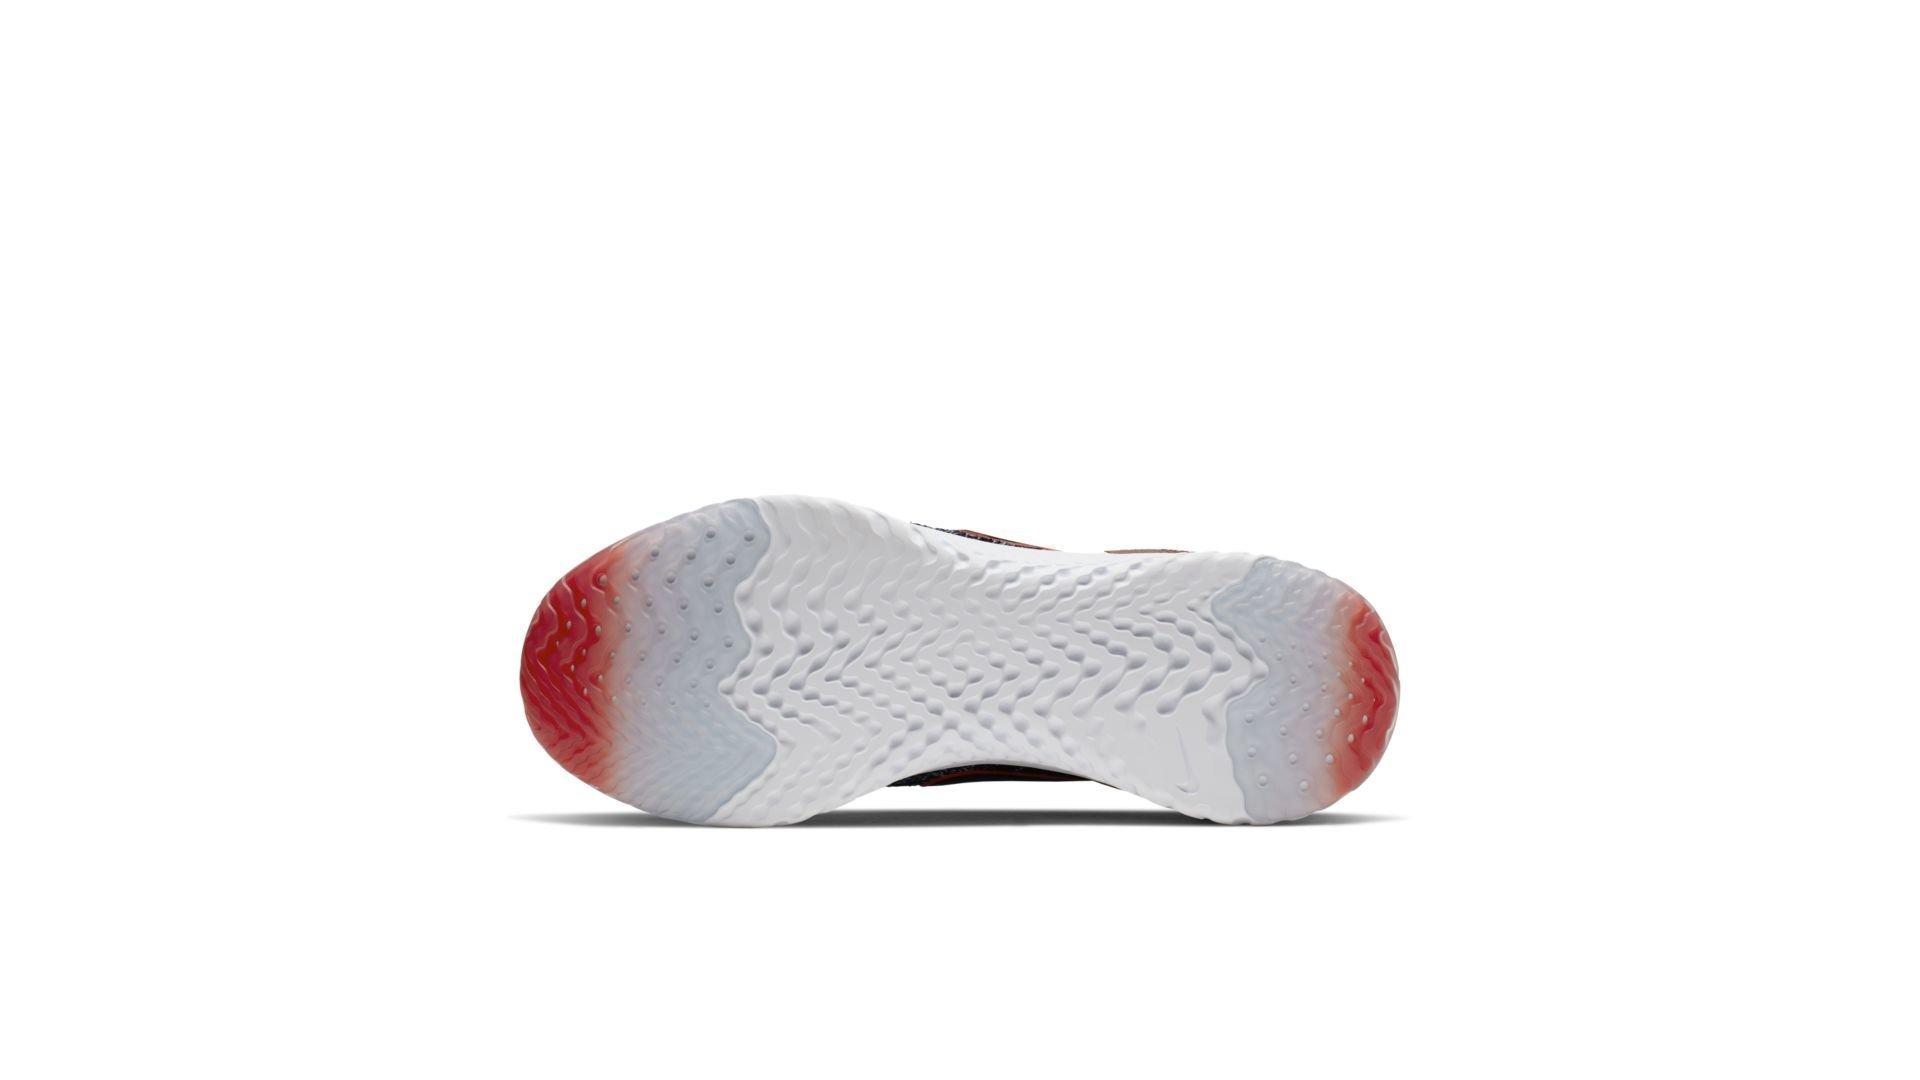 Nike Epic React Flyknit 2 Rabid Panda (CJ0770-400)